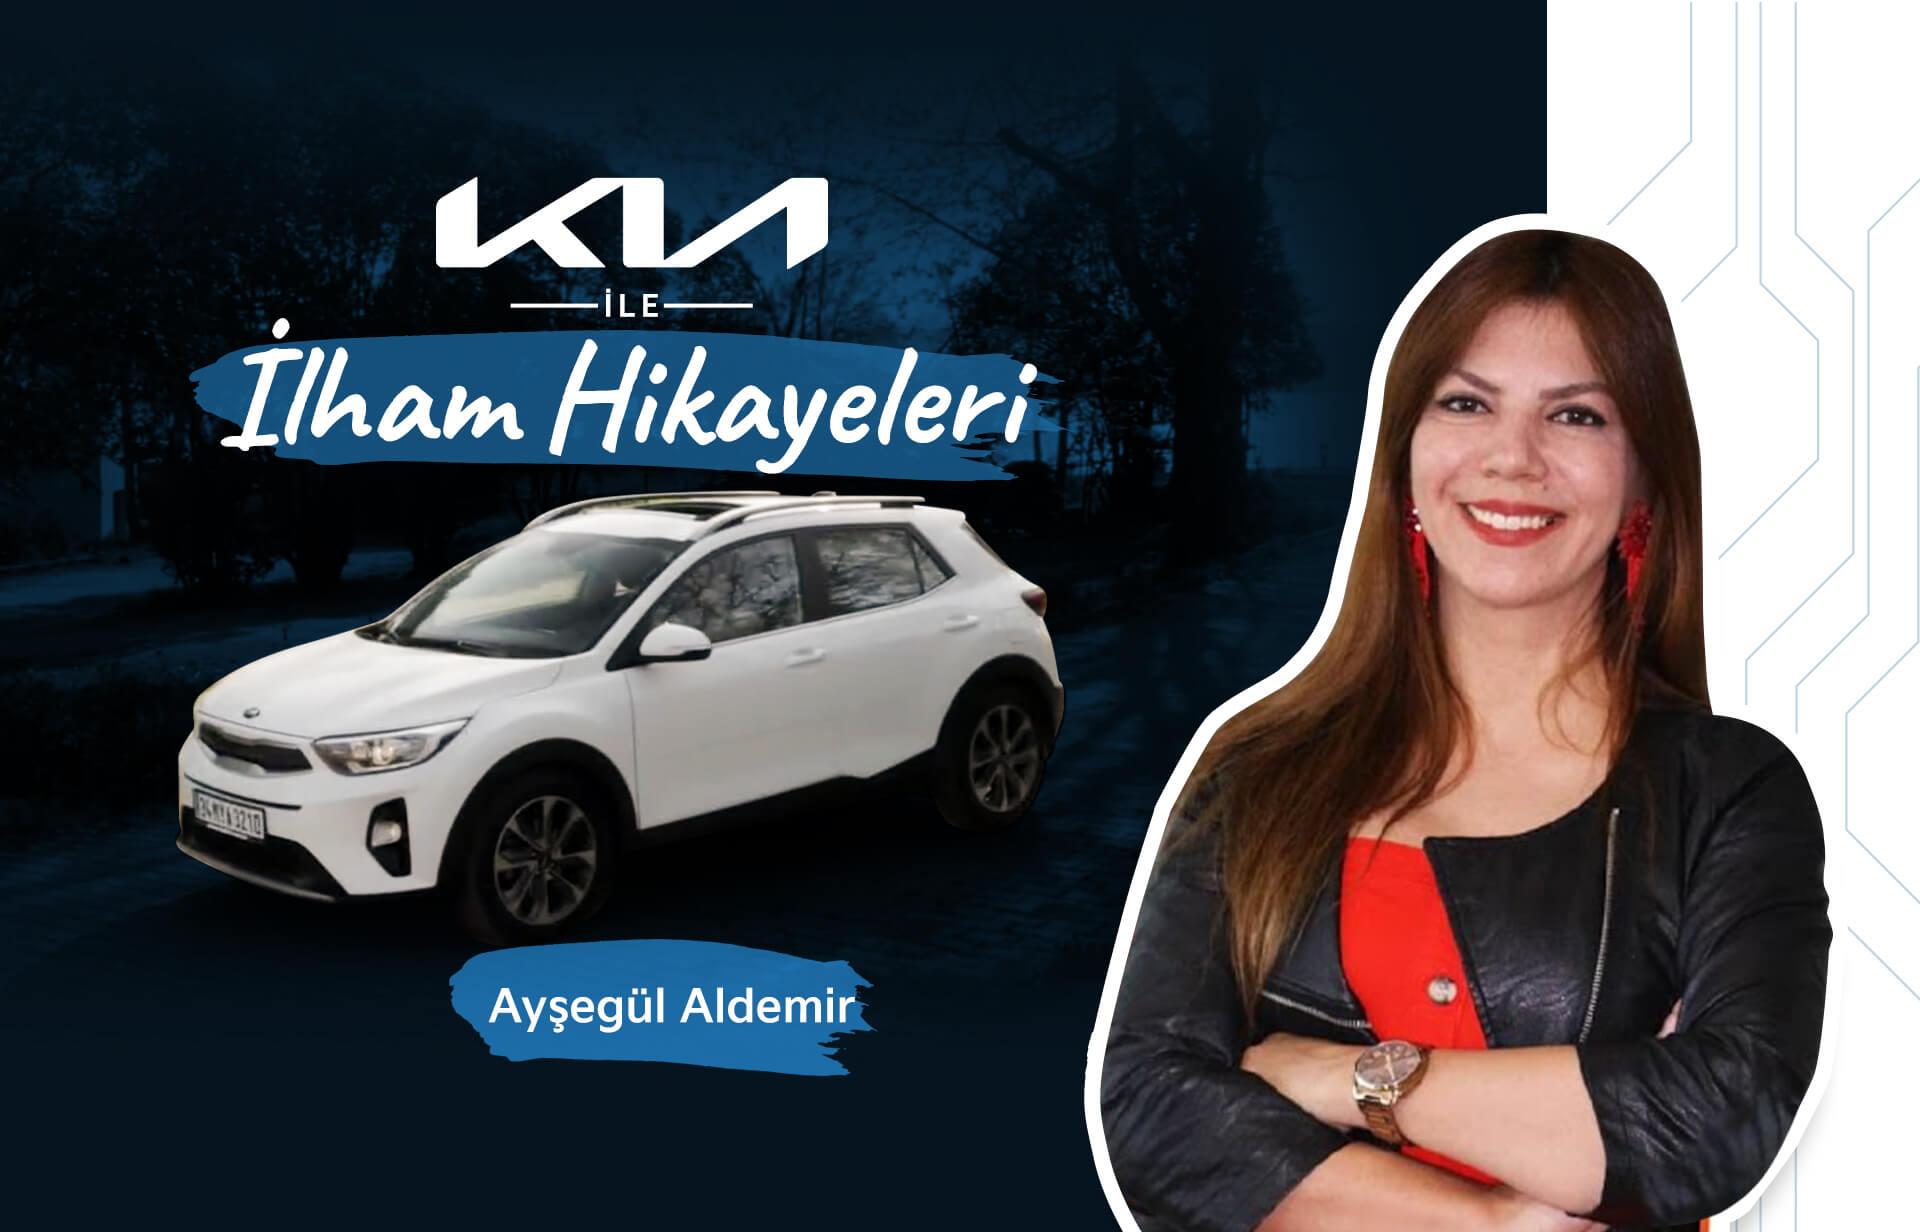 Kia_AysegulAldemir_1920x1232